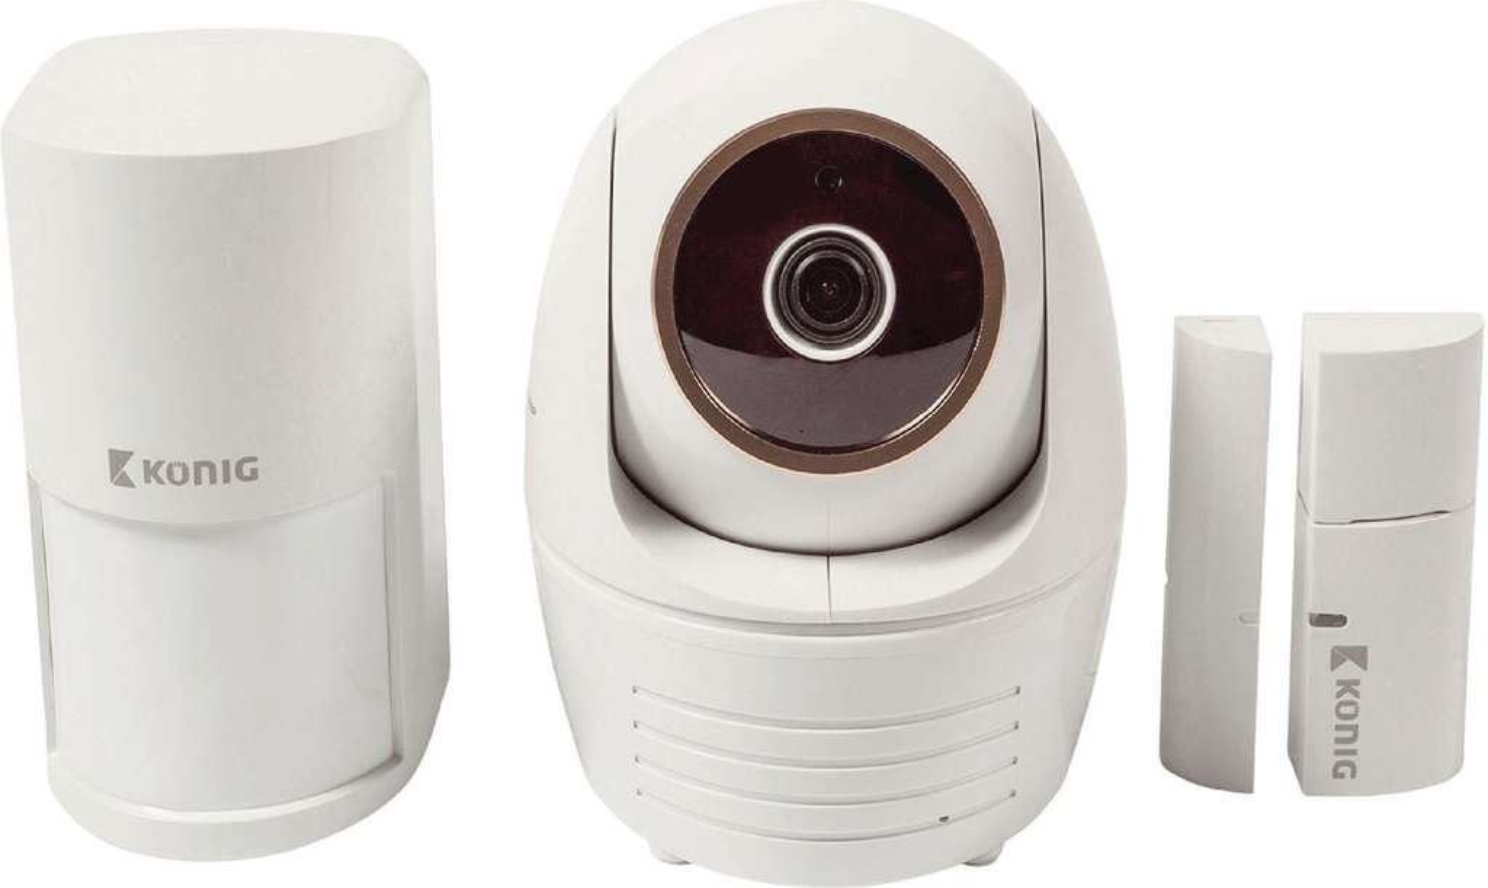 k nig sas setipc011w wlan ip berwachungskamera set full. Black Bedroom Furniture Sets. Home Design Ideas